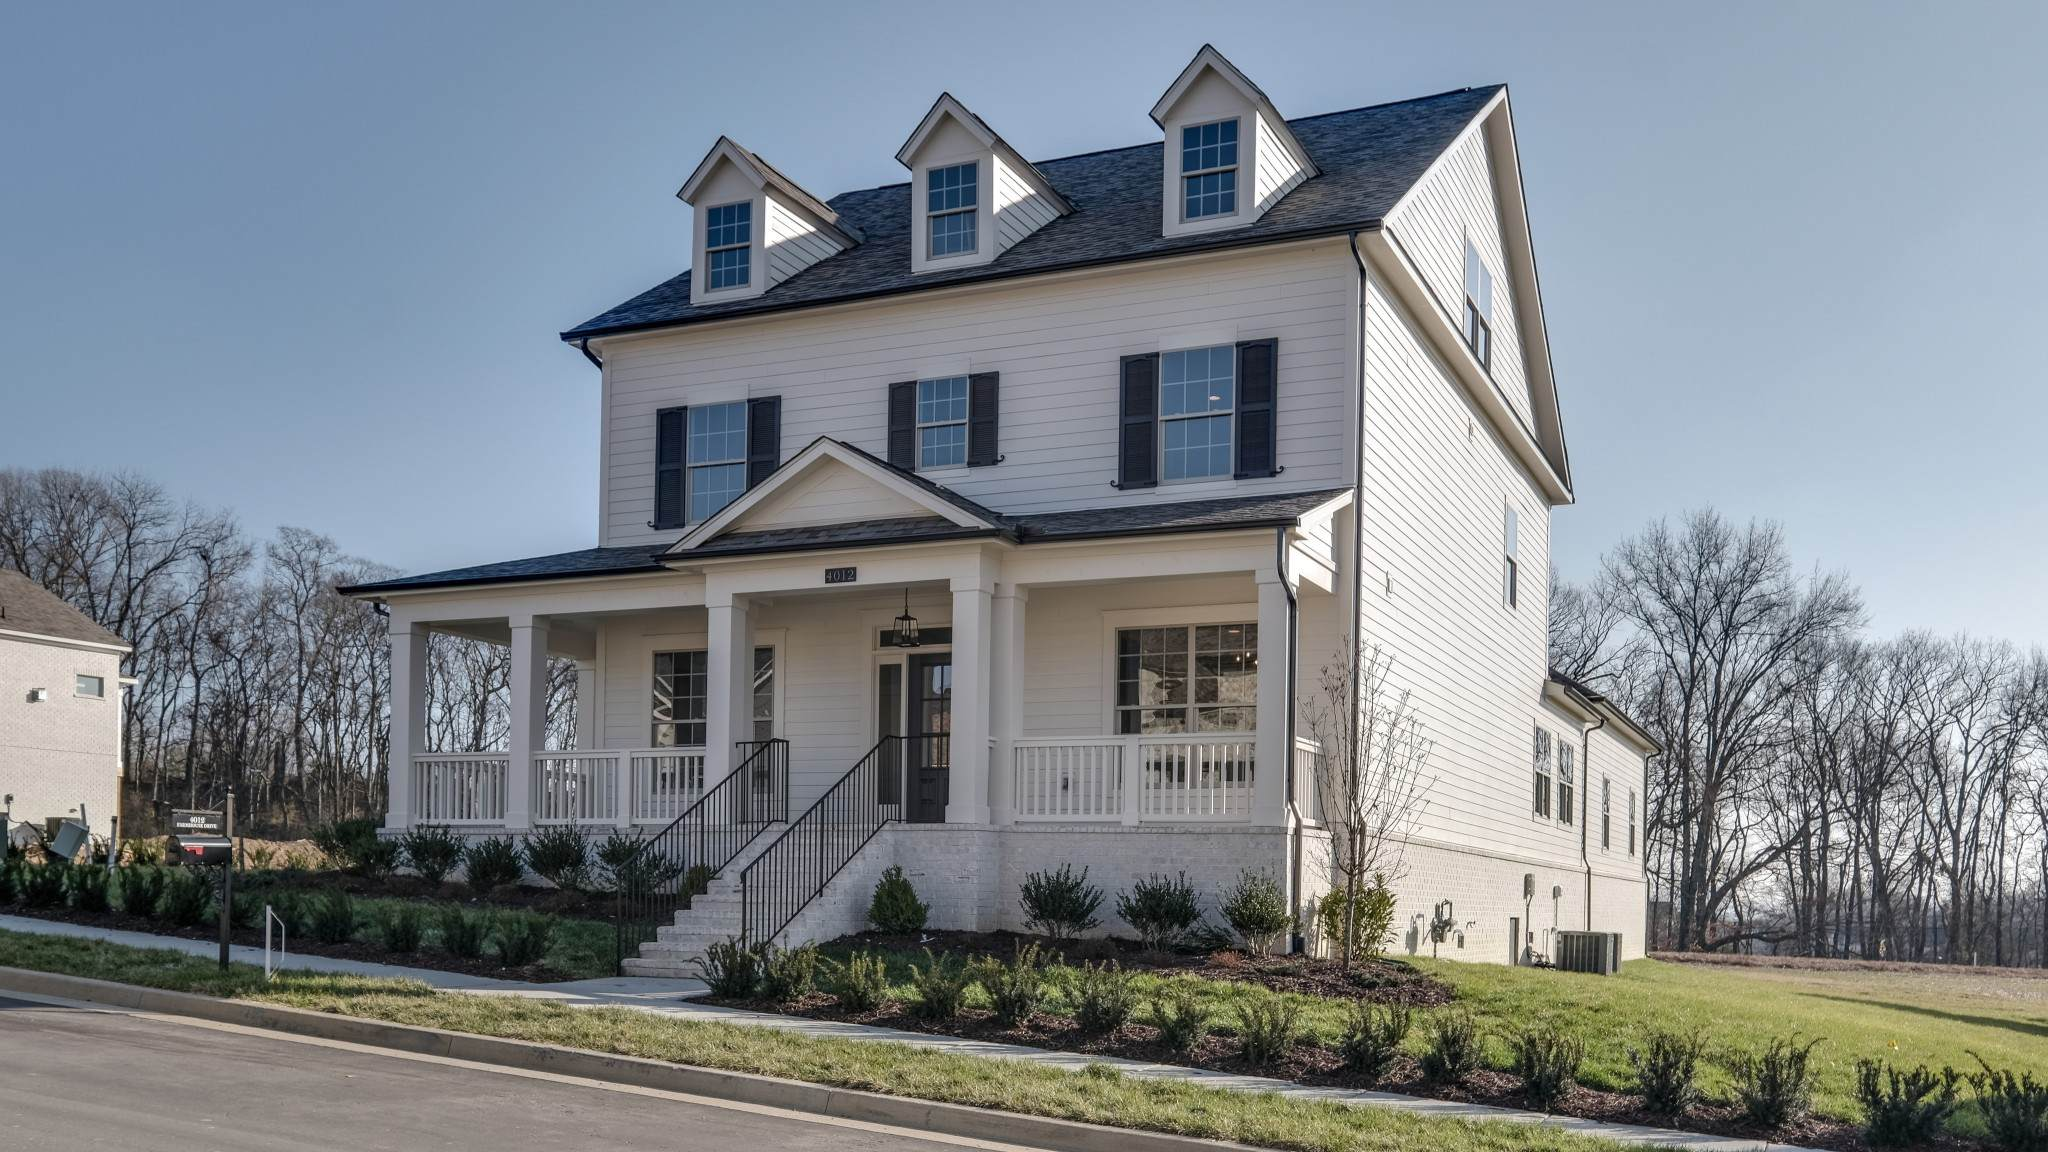 4012 Farmhouse Drive Lot 58, Franklin, TN 37067 (MLS #RTC2049999) :: Fridrich & Clark Realty, LLC